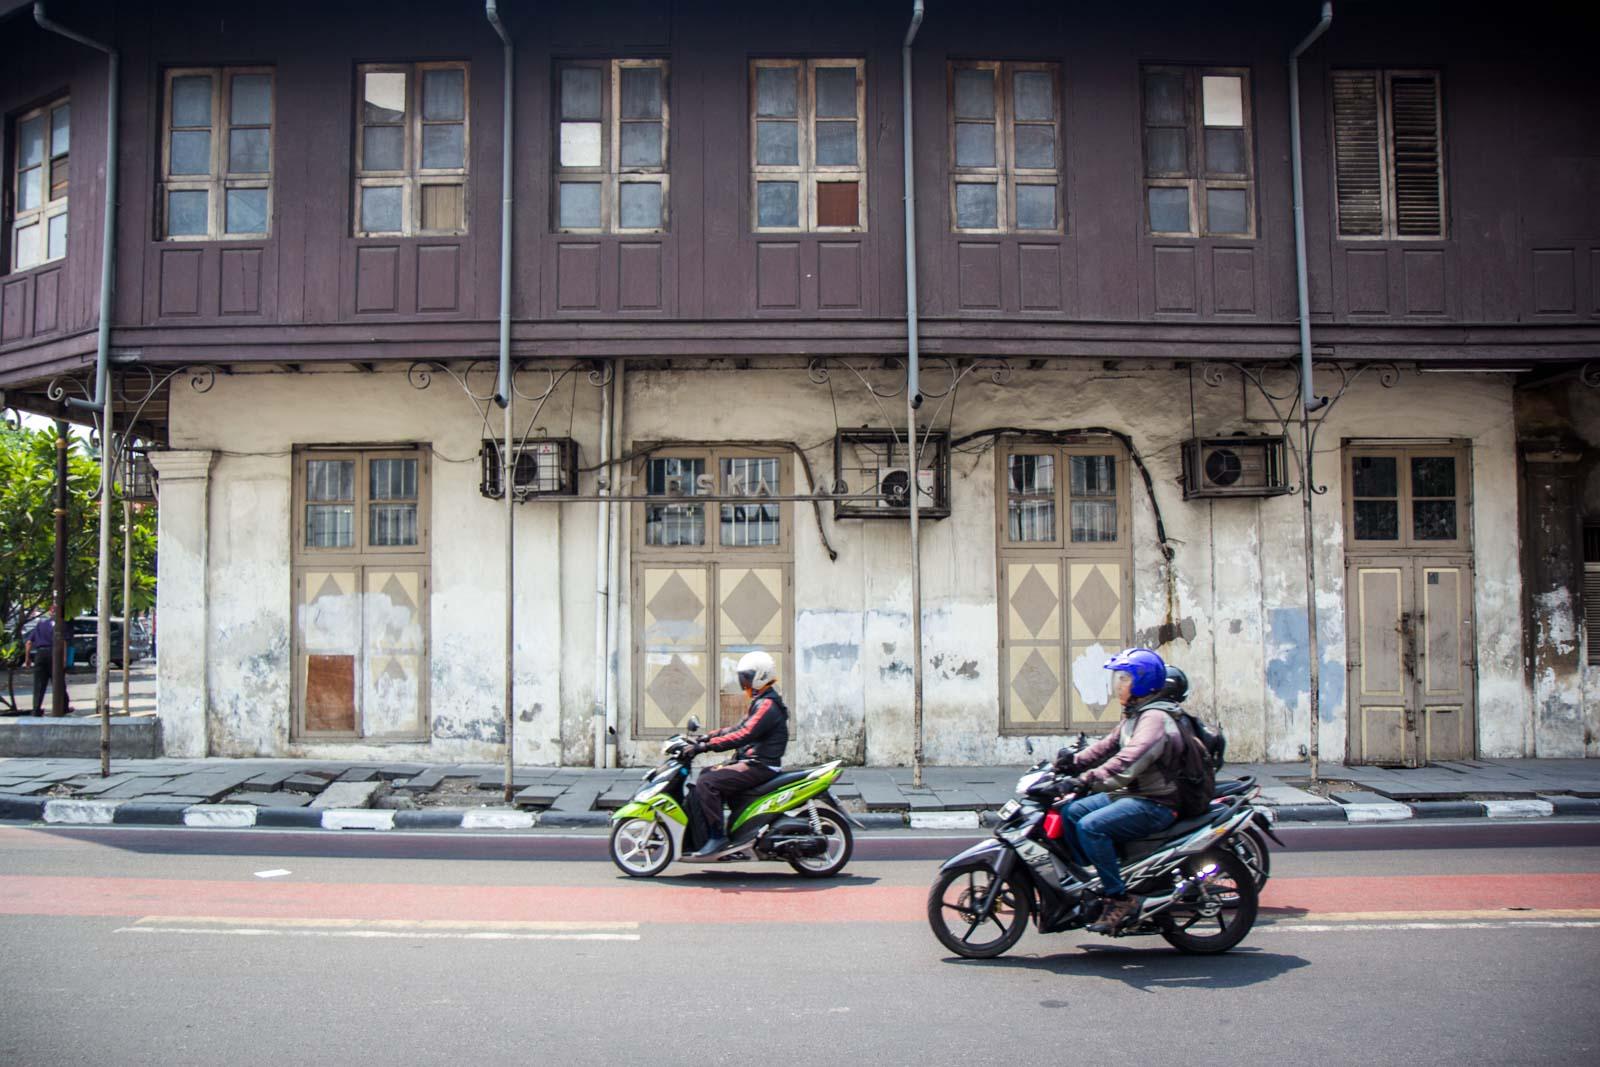 What to see around Kota Tua, Jakarta Old Town, Indonesia